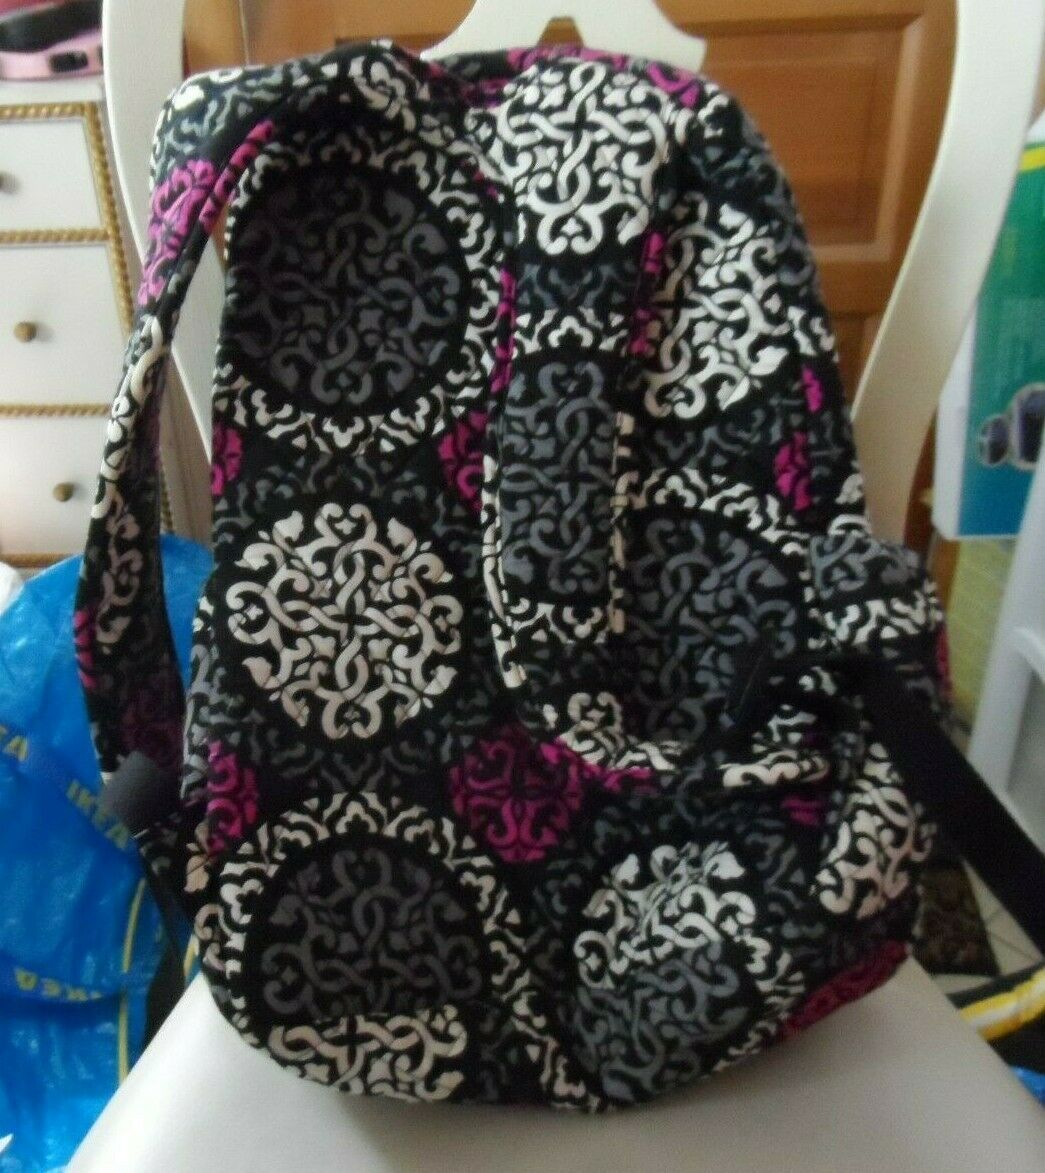 Vera Bradley Backpack baby bag in Canterberry Magenta image 2